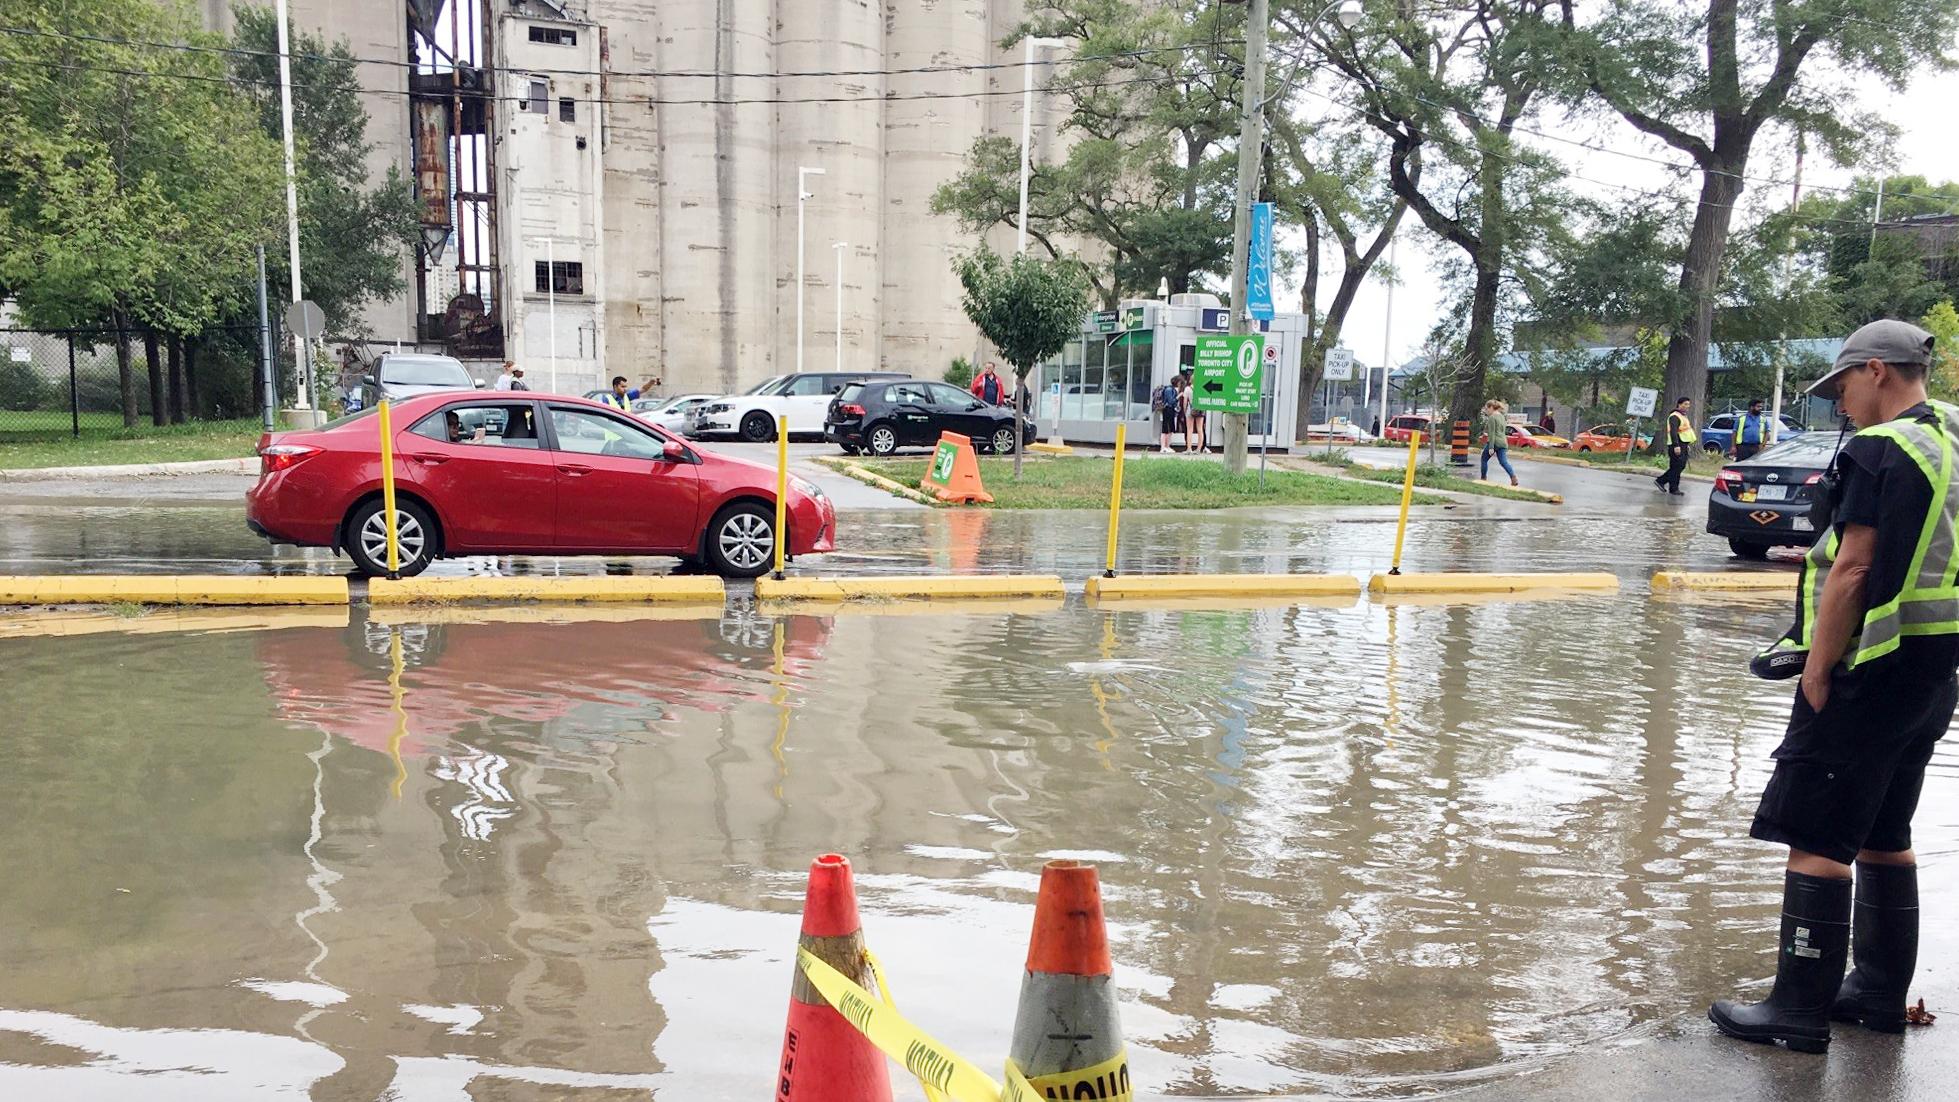 Water floods the street near Billy Bishop Toronto City Airport's mainland building after a watermain break on Sept. 20, 2018. CITYNEWS/Josef Fazio